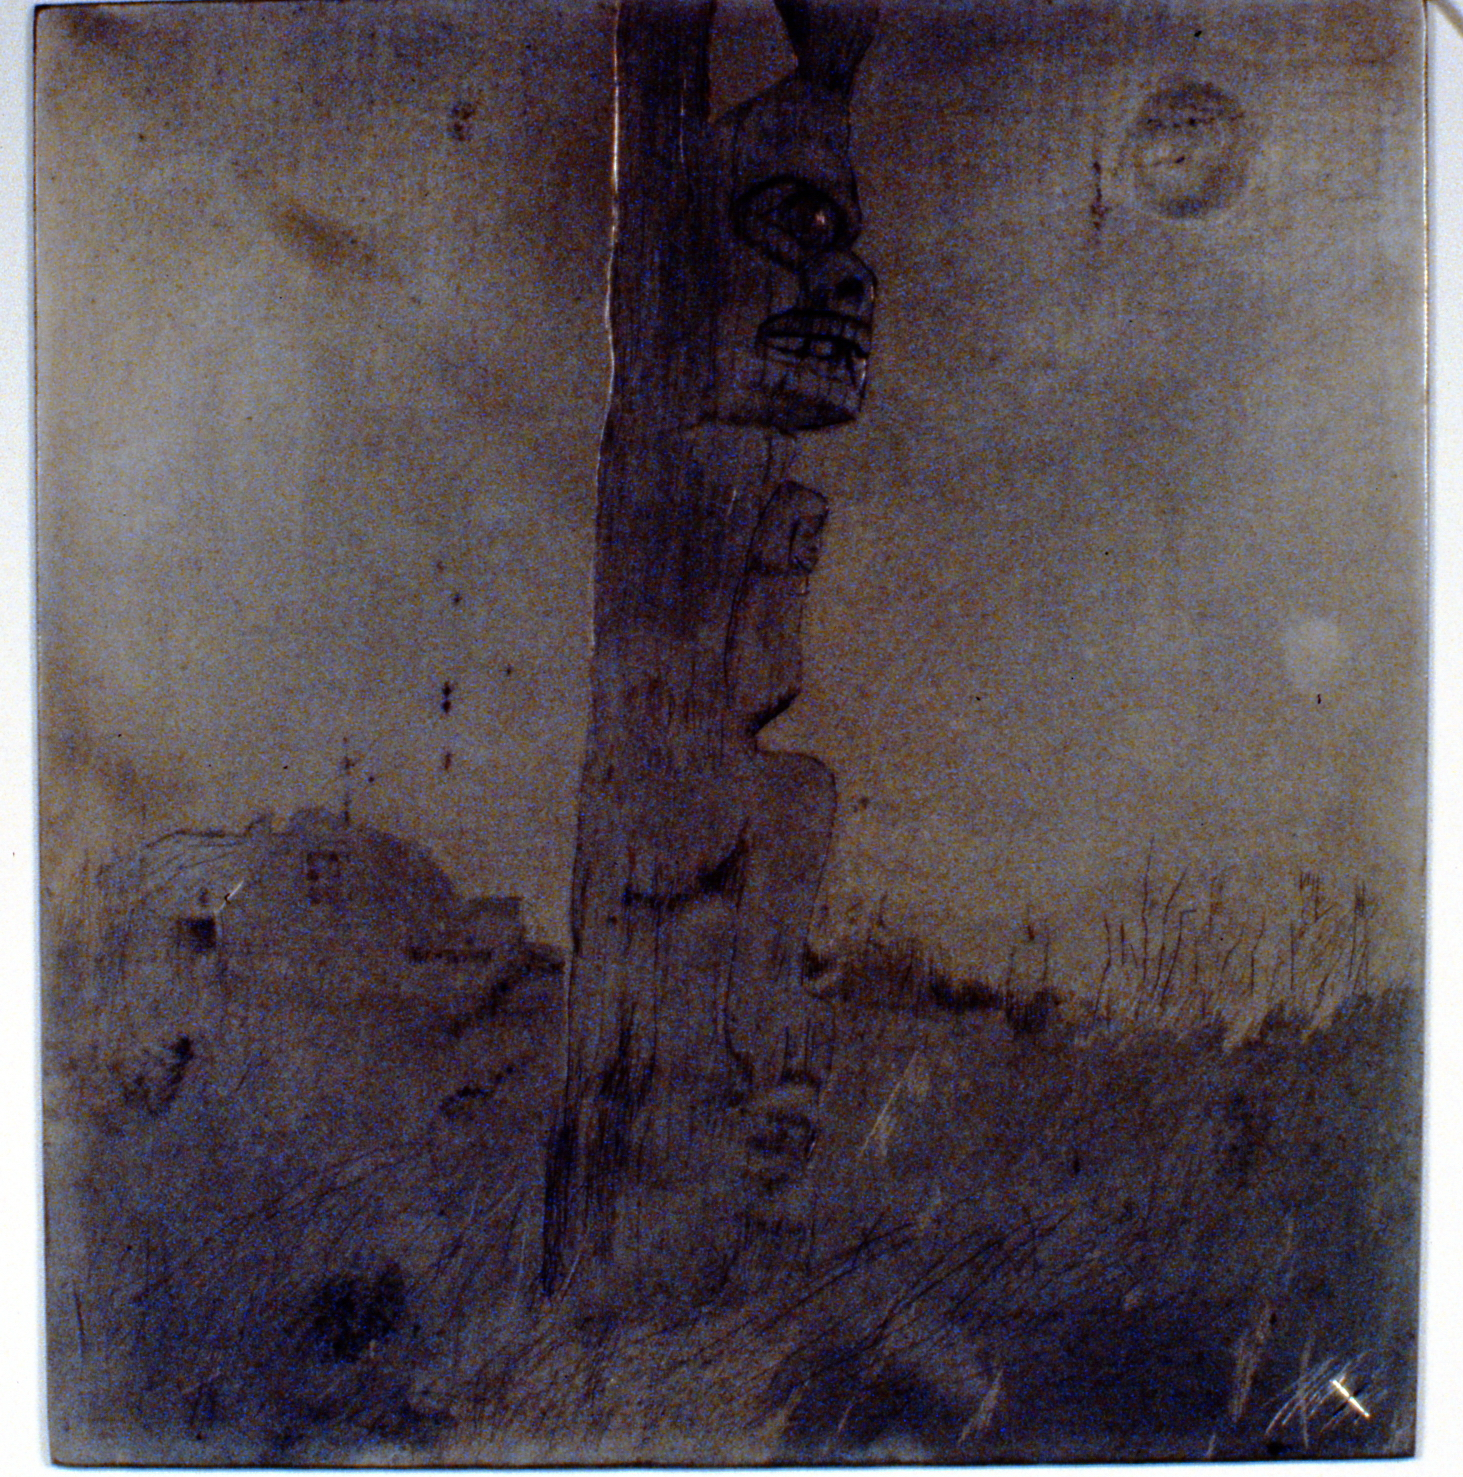 Village Watch , 1980, Minn Sjølseth, aluminum plate, 23 x 22 cm, 1996.02.21